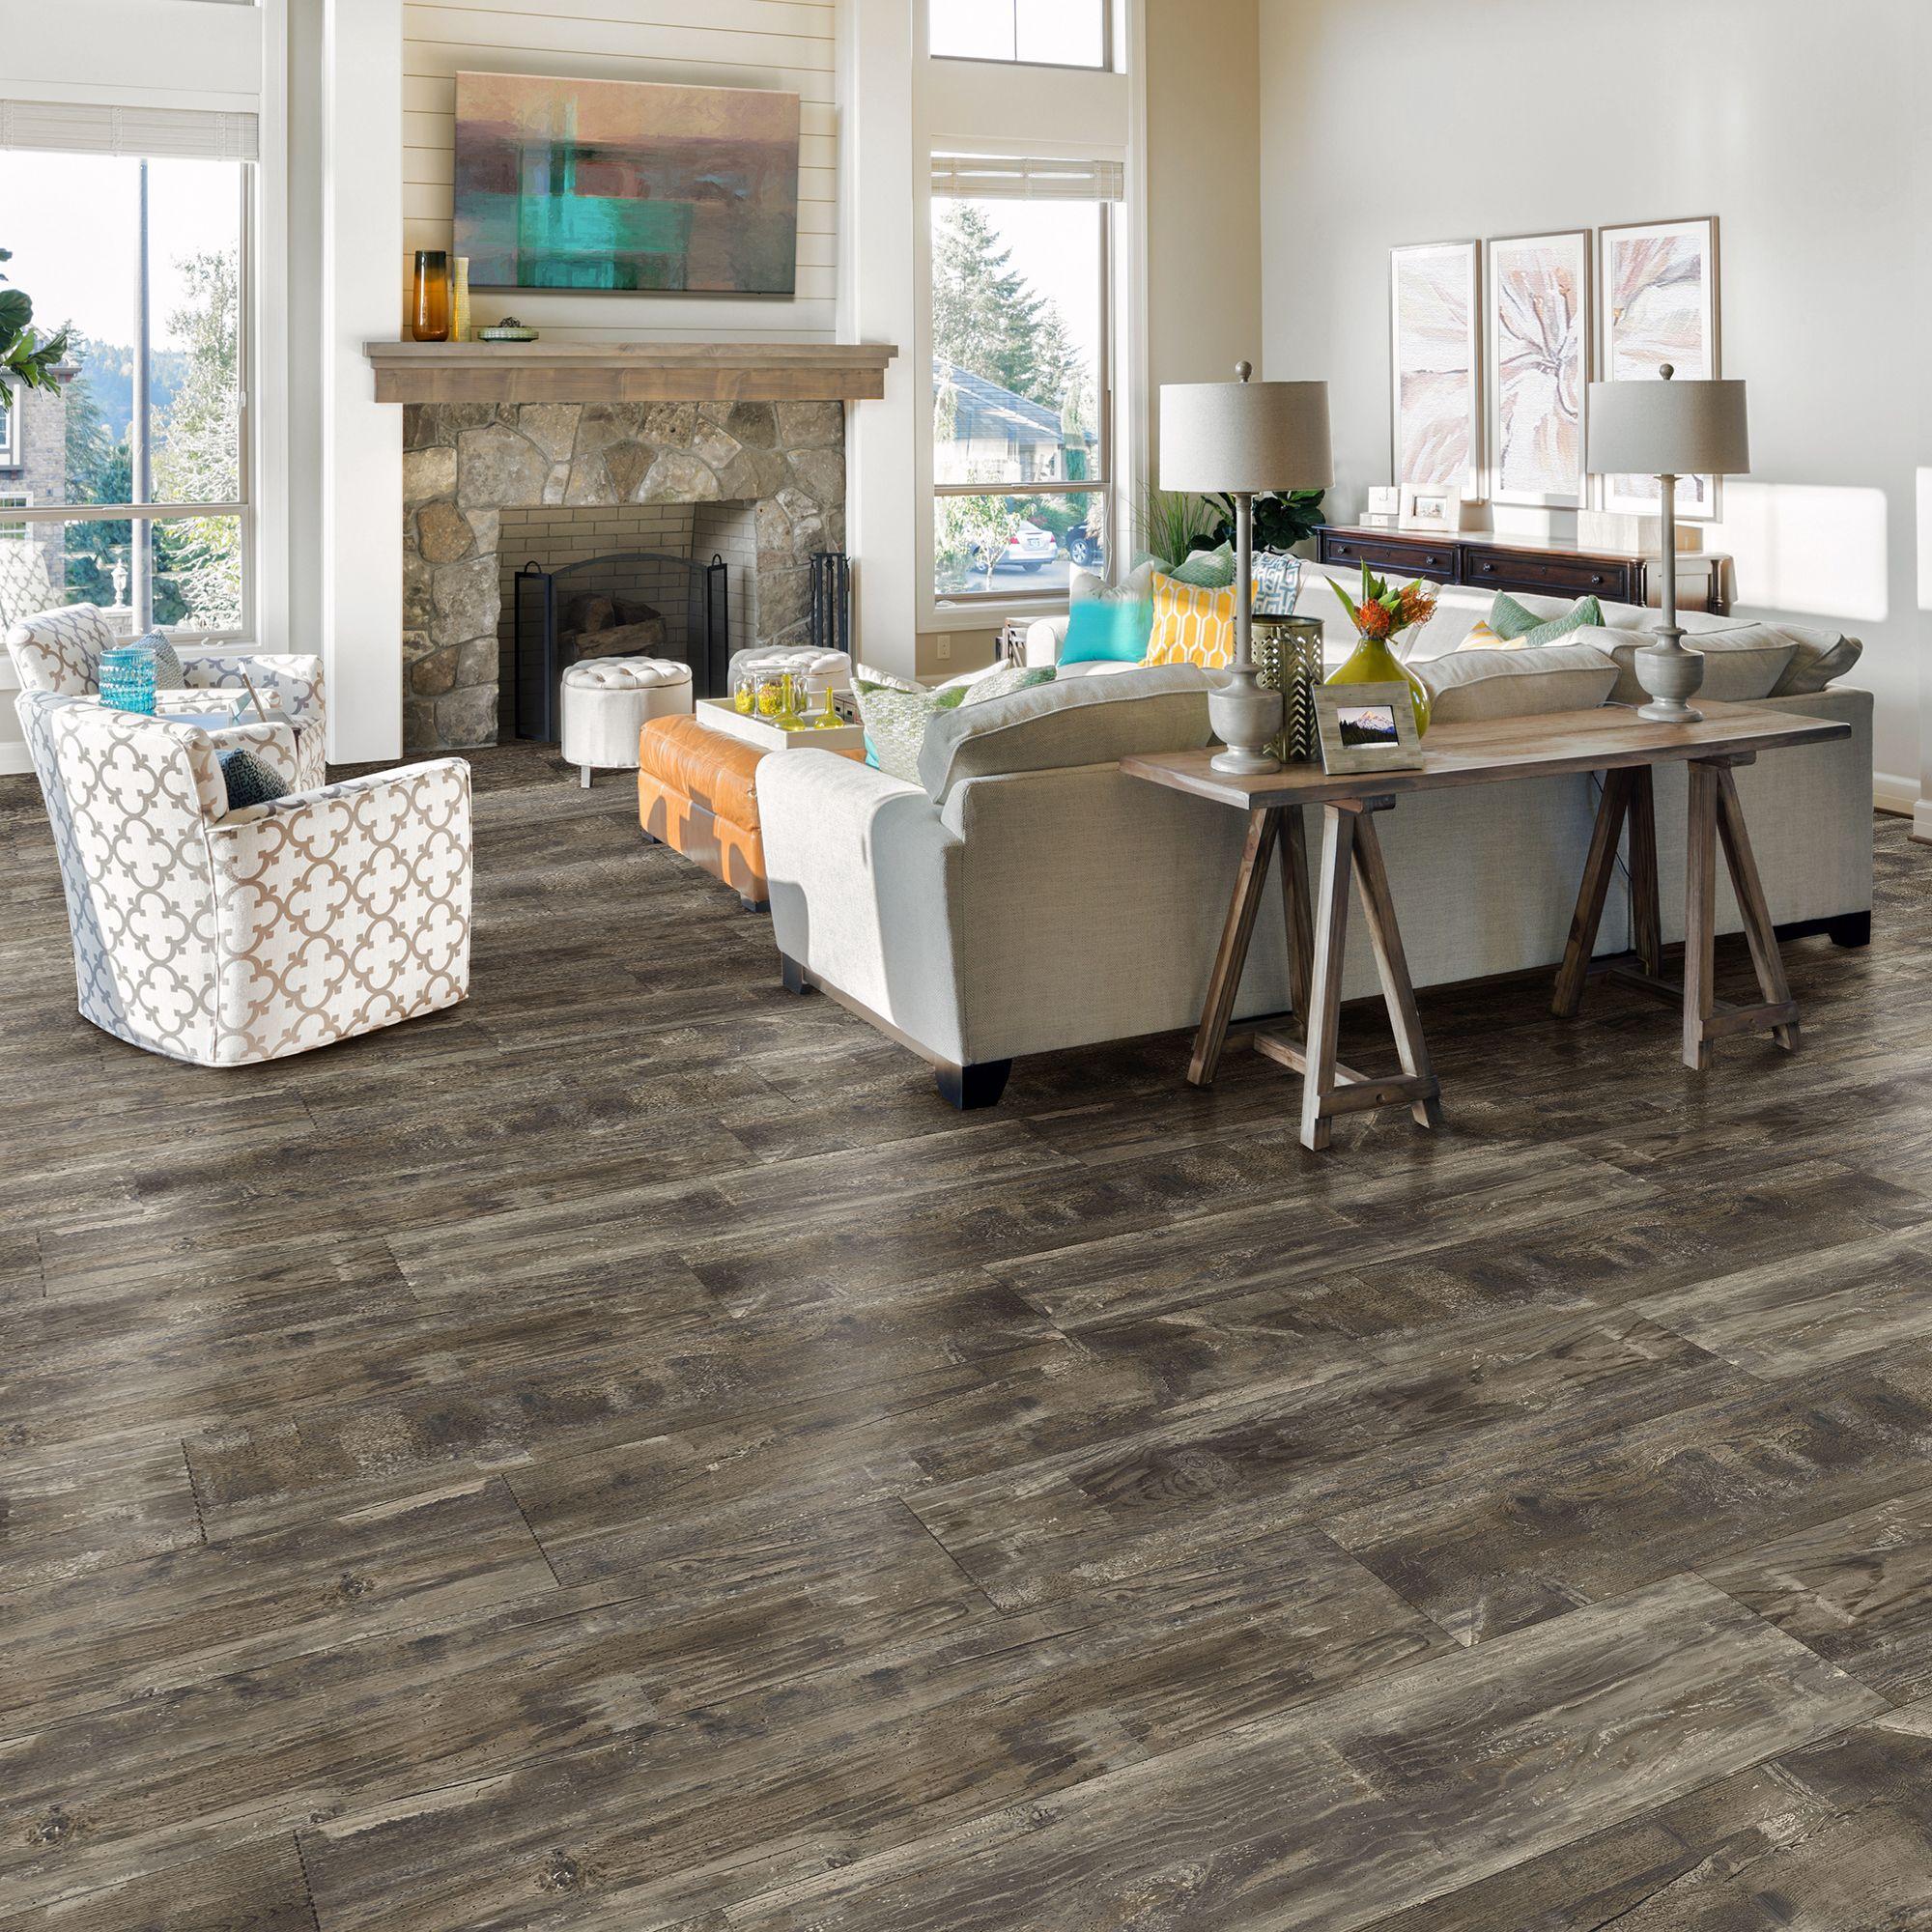 Can You Put Ceramic Tile Over Hardwood Floors